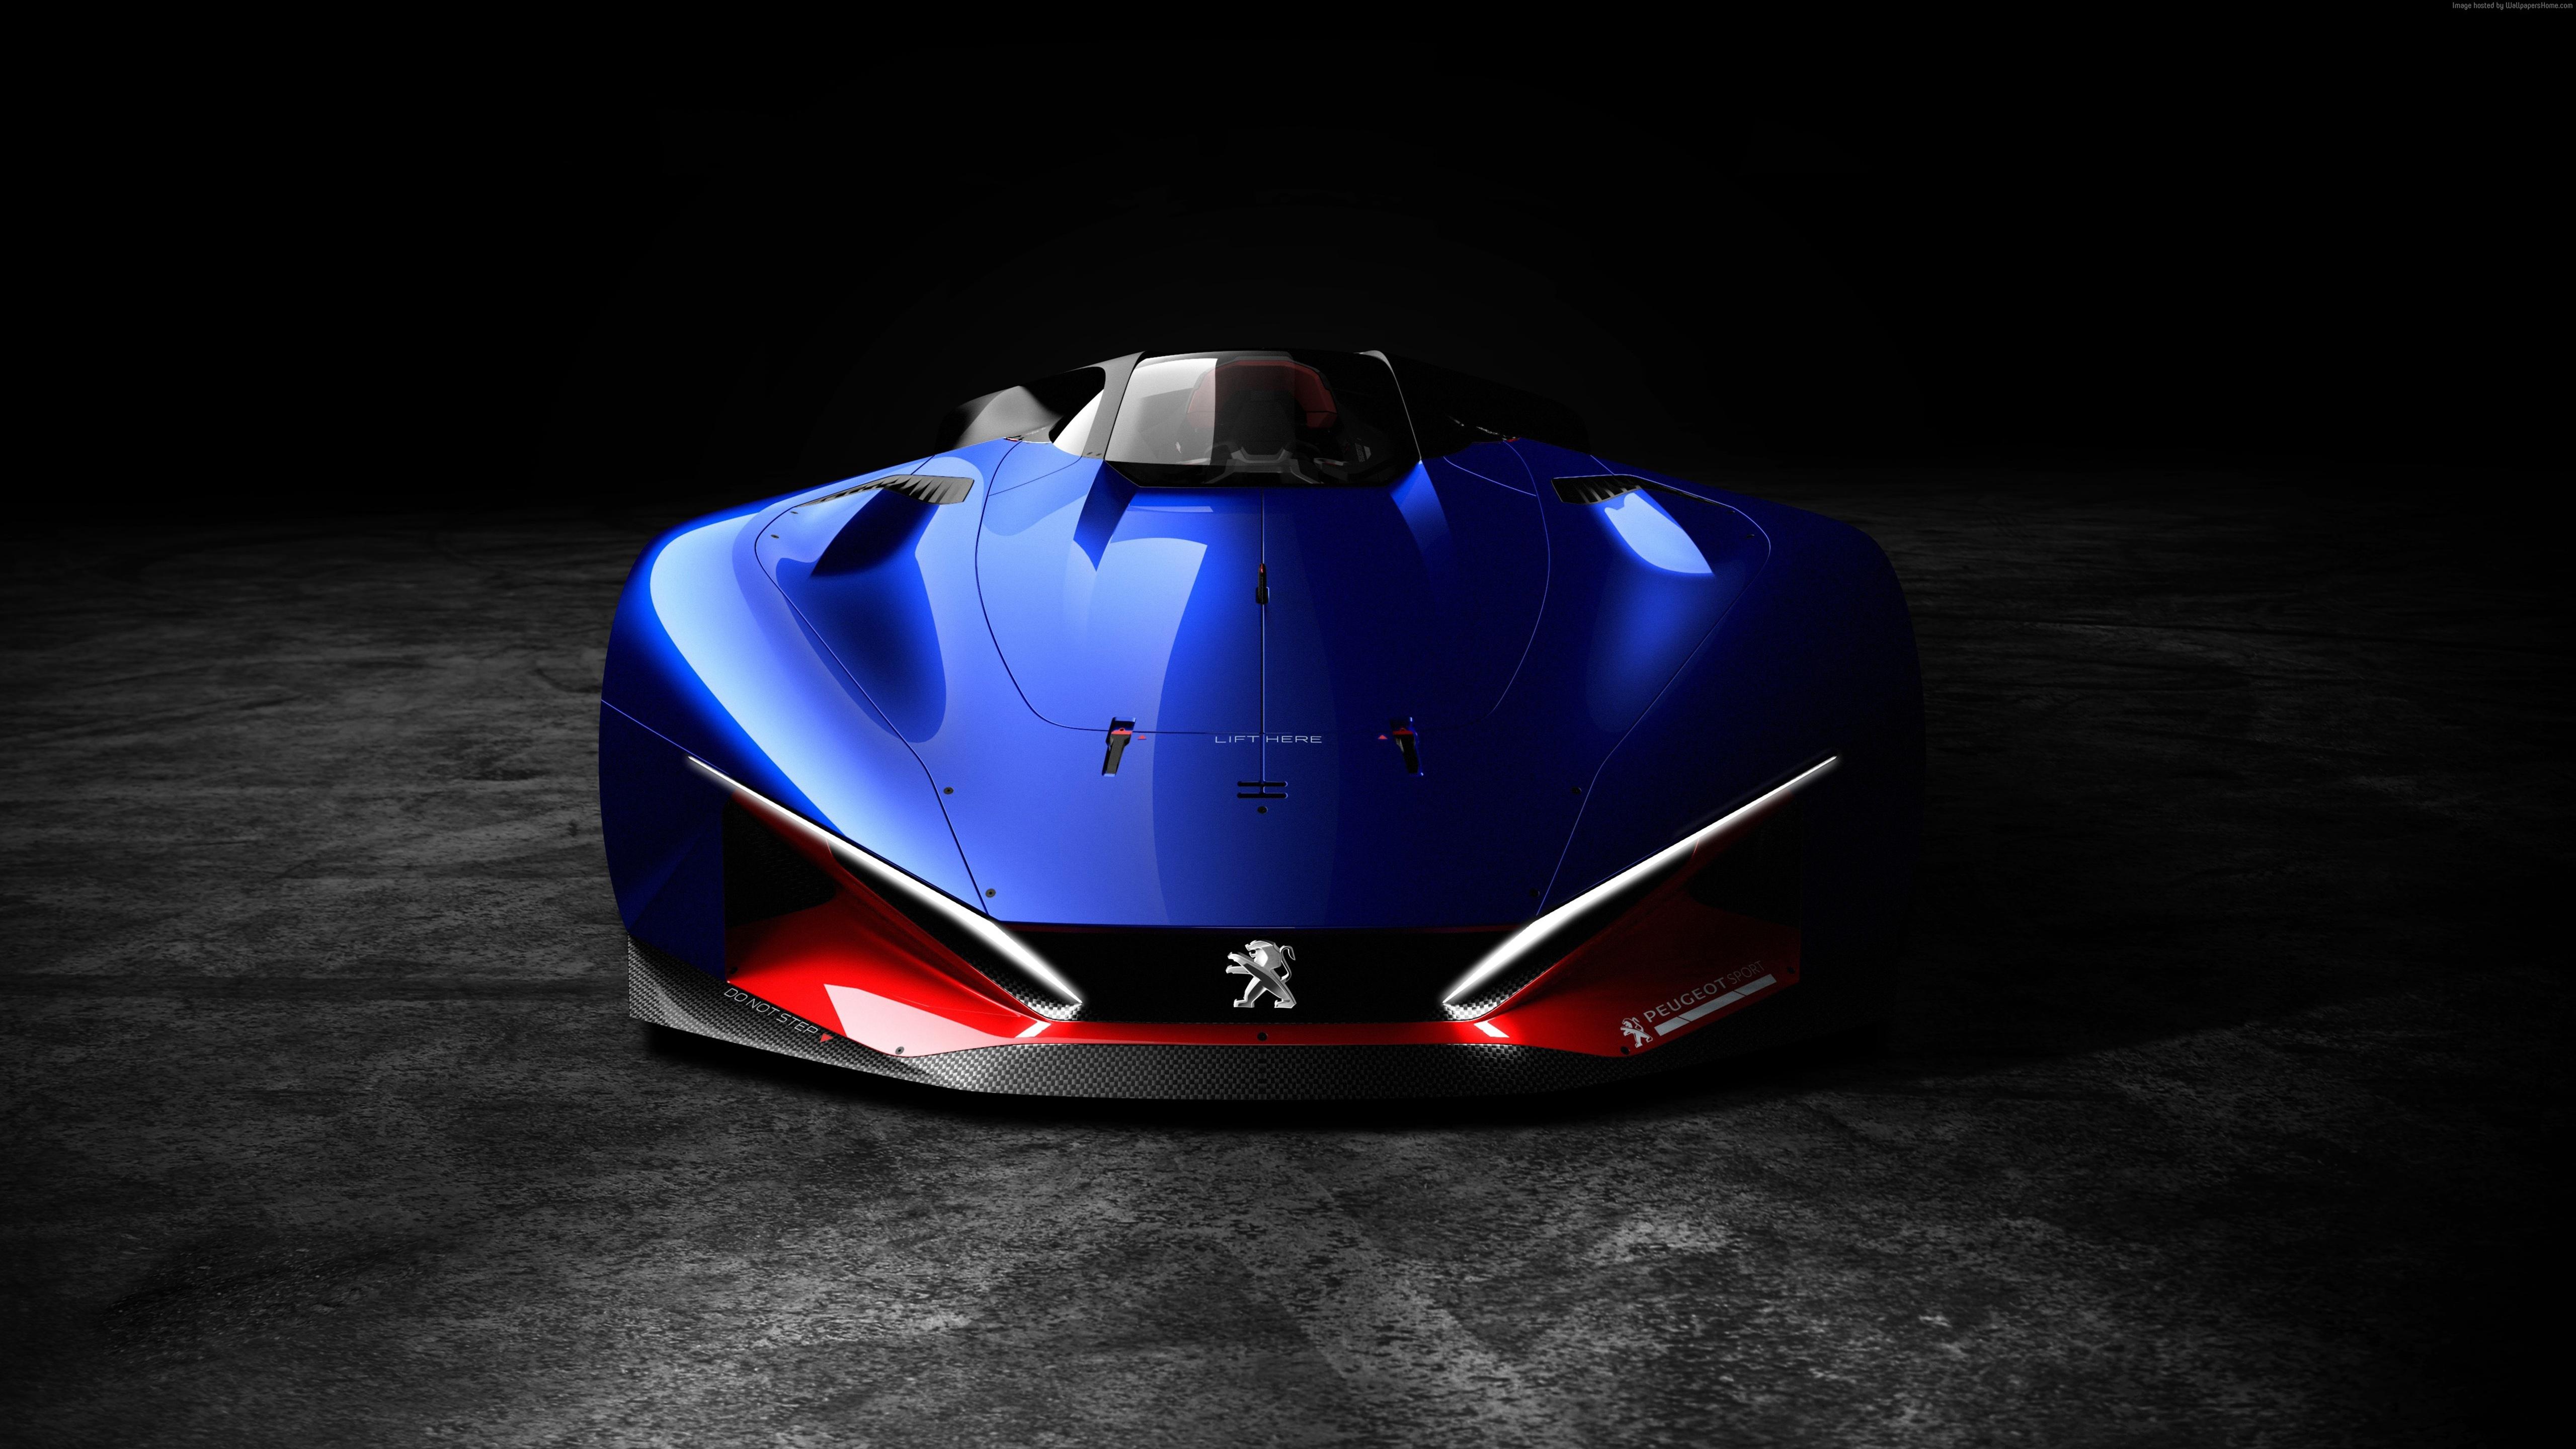 2016 Peugeot L500 R Concept Car, HD Cars, 4k Wallpapers, Images ...